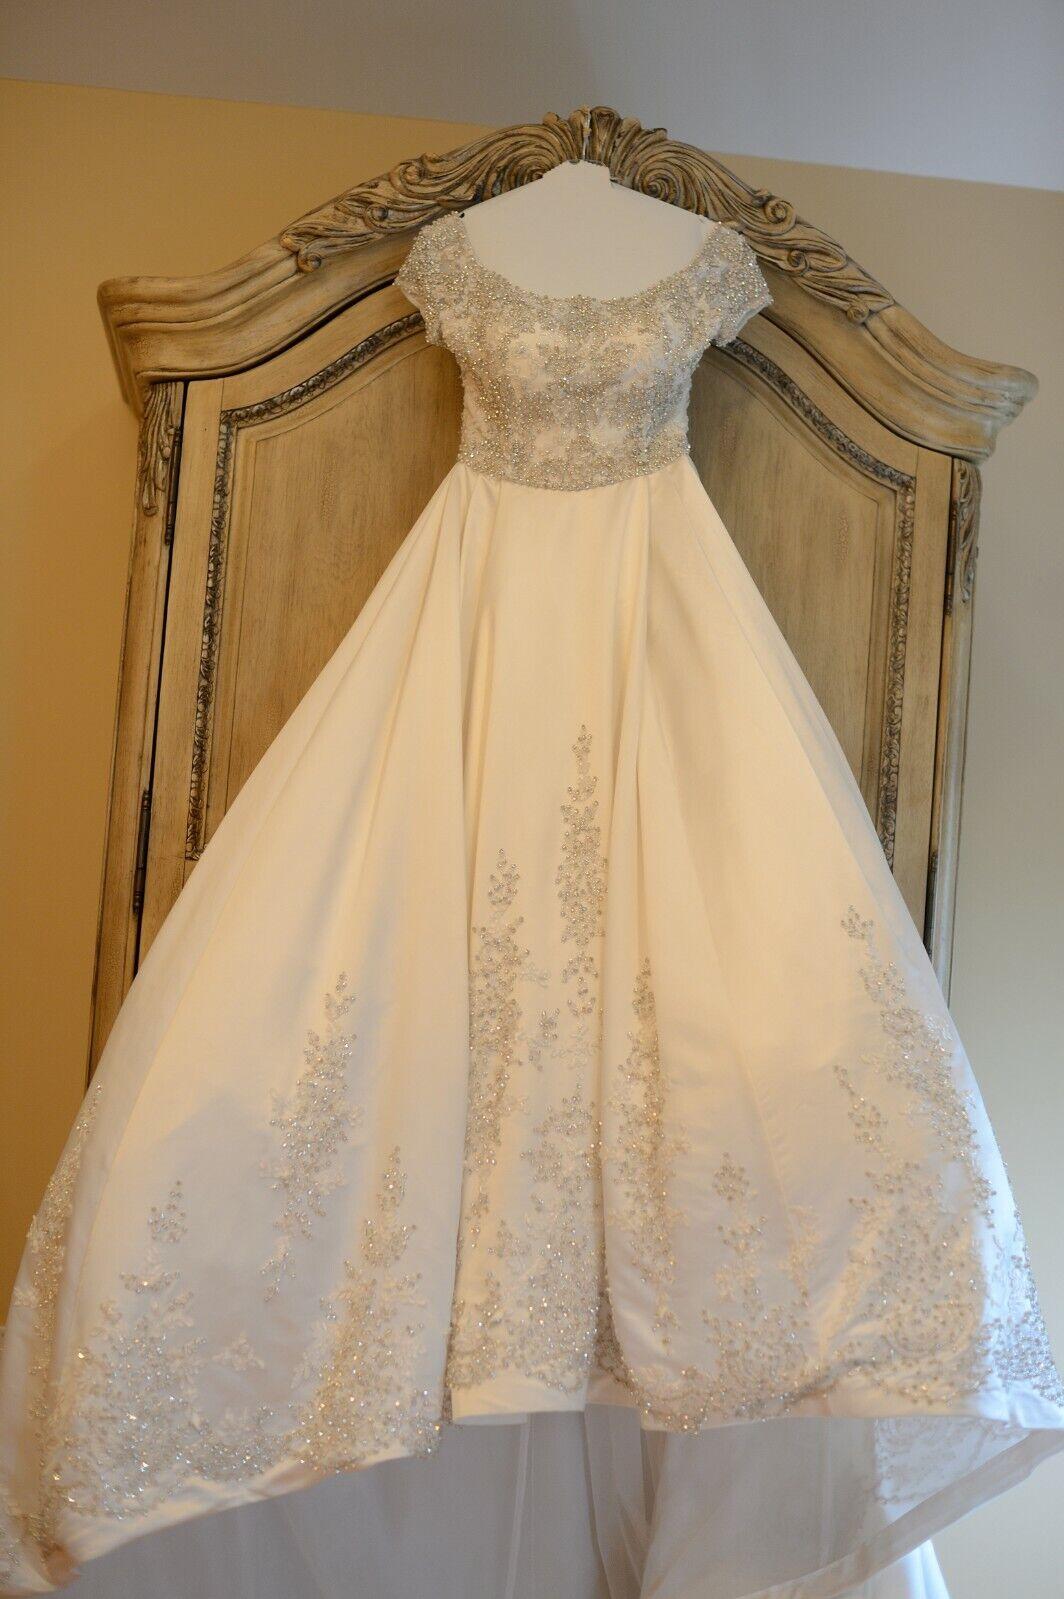 Stephen Yearick Wedding Dress Ball Gown KSY49 Sz 6 Swarovski Crystals Long Train